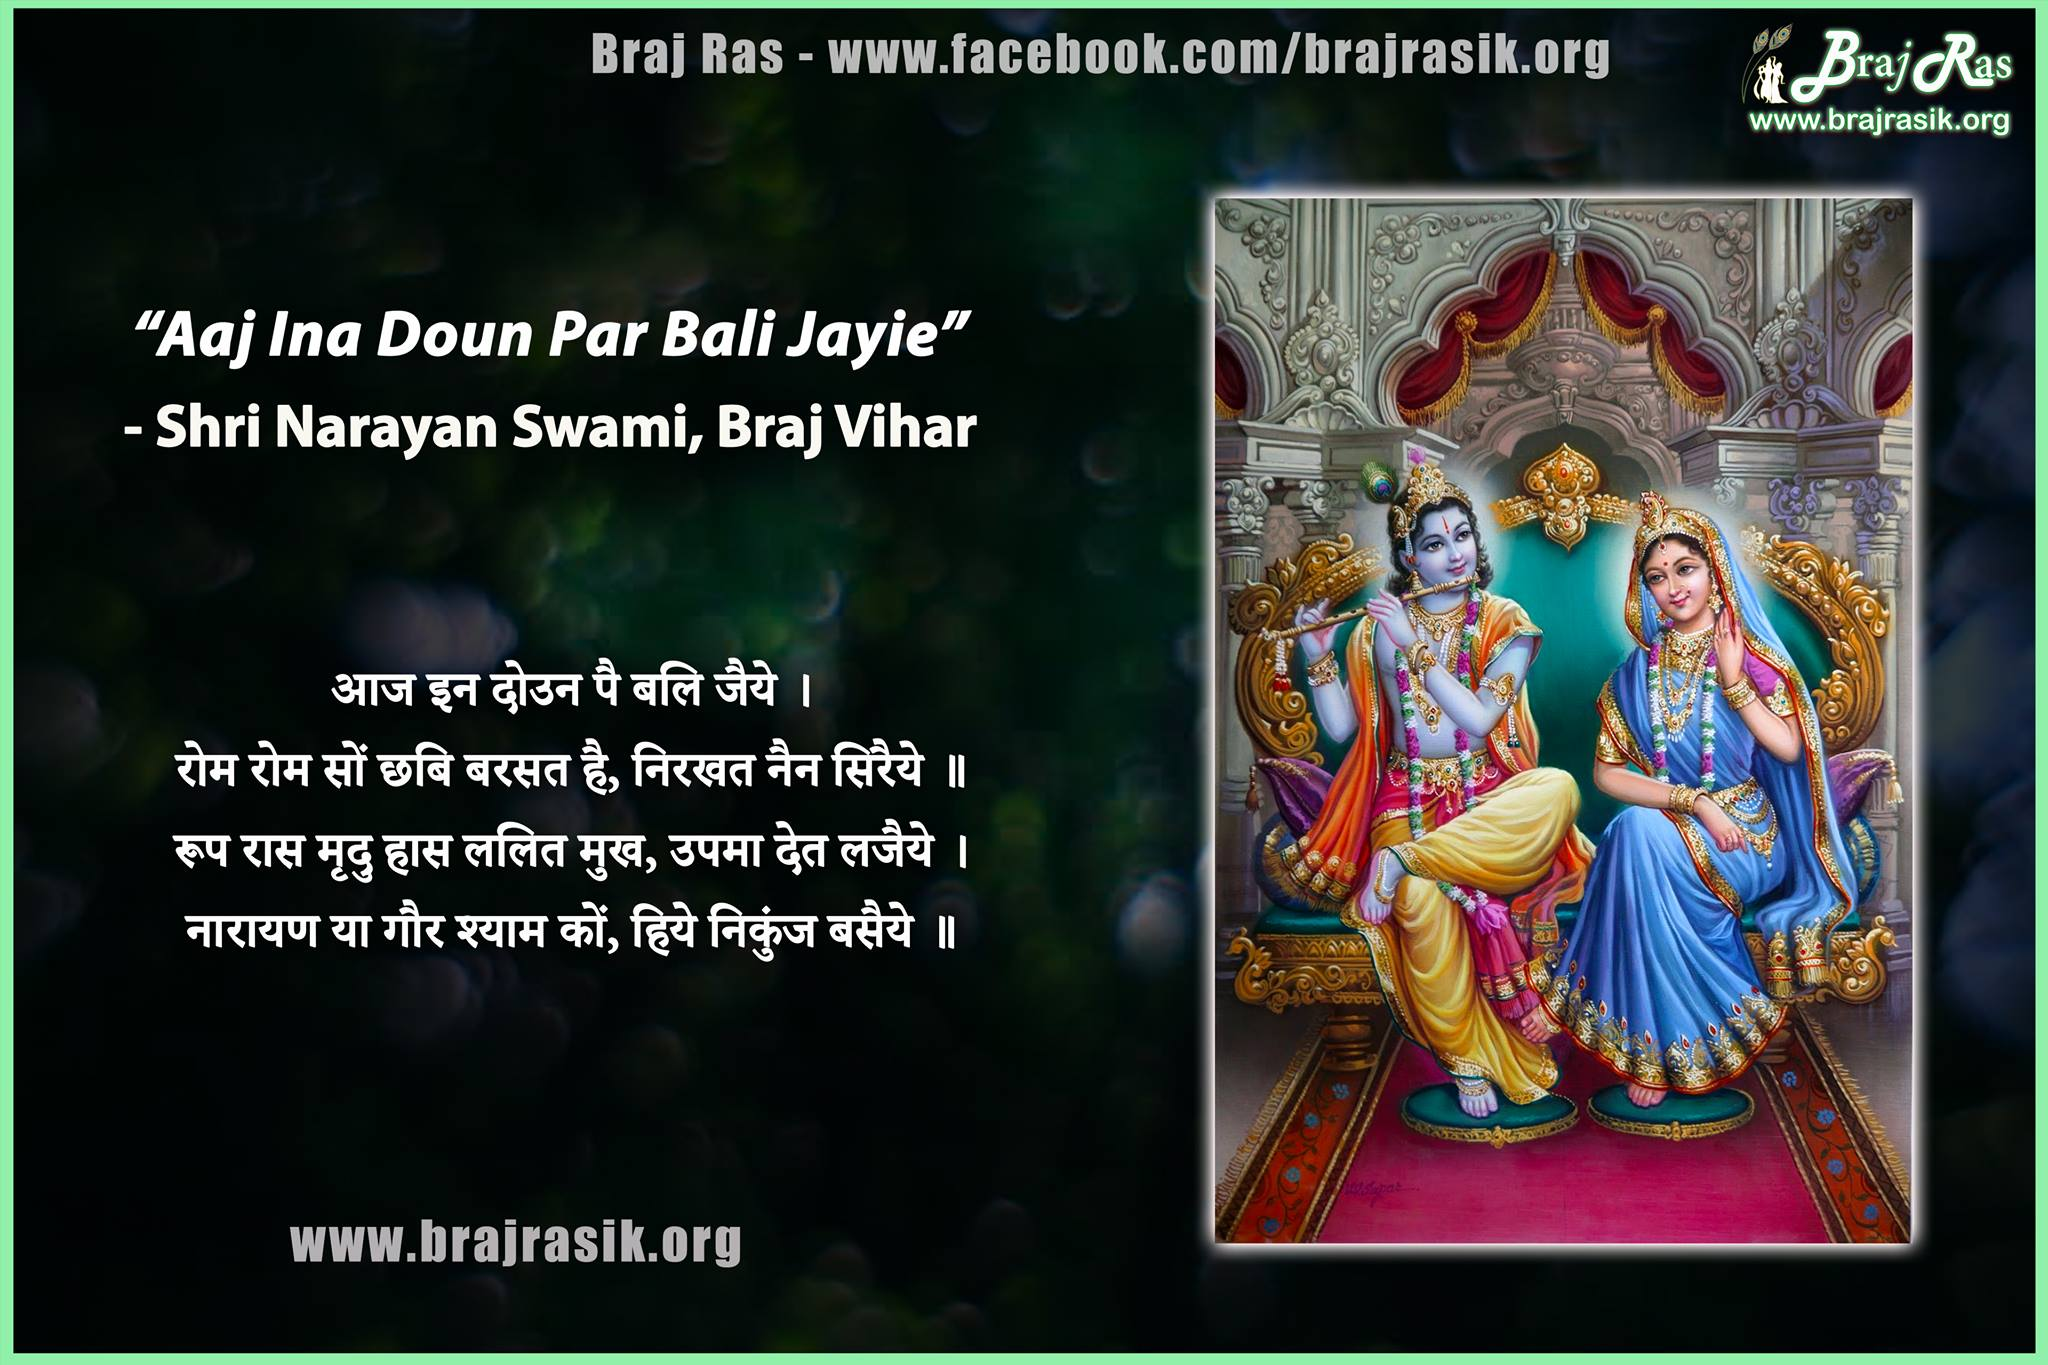 """Aaj Ina Doun Par Bali Jayie"" - Shri Narayan Swami, Braj Vihar"